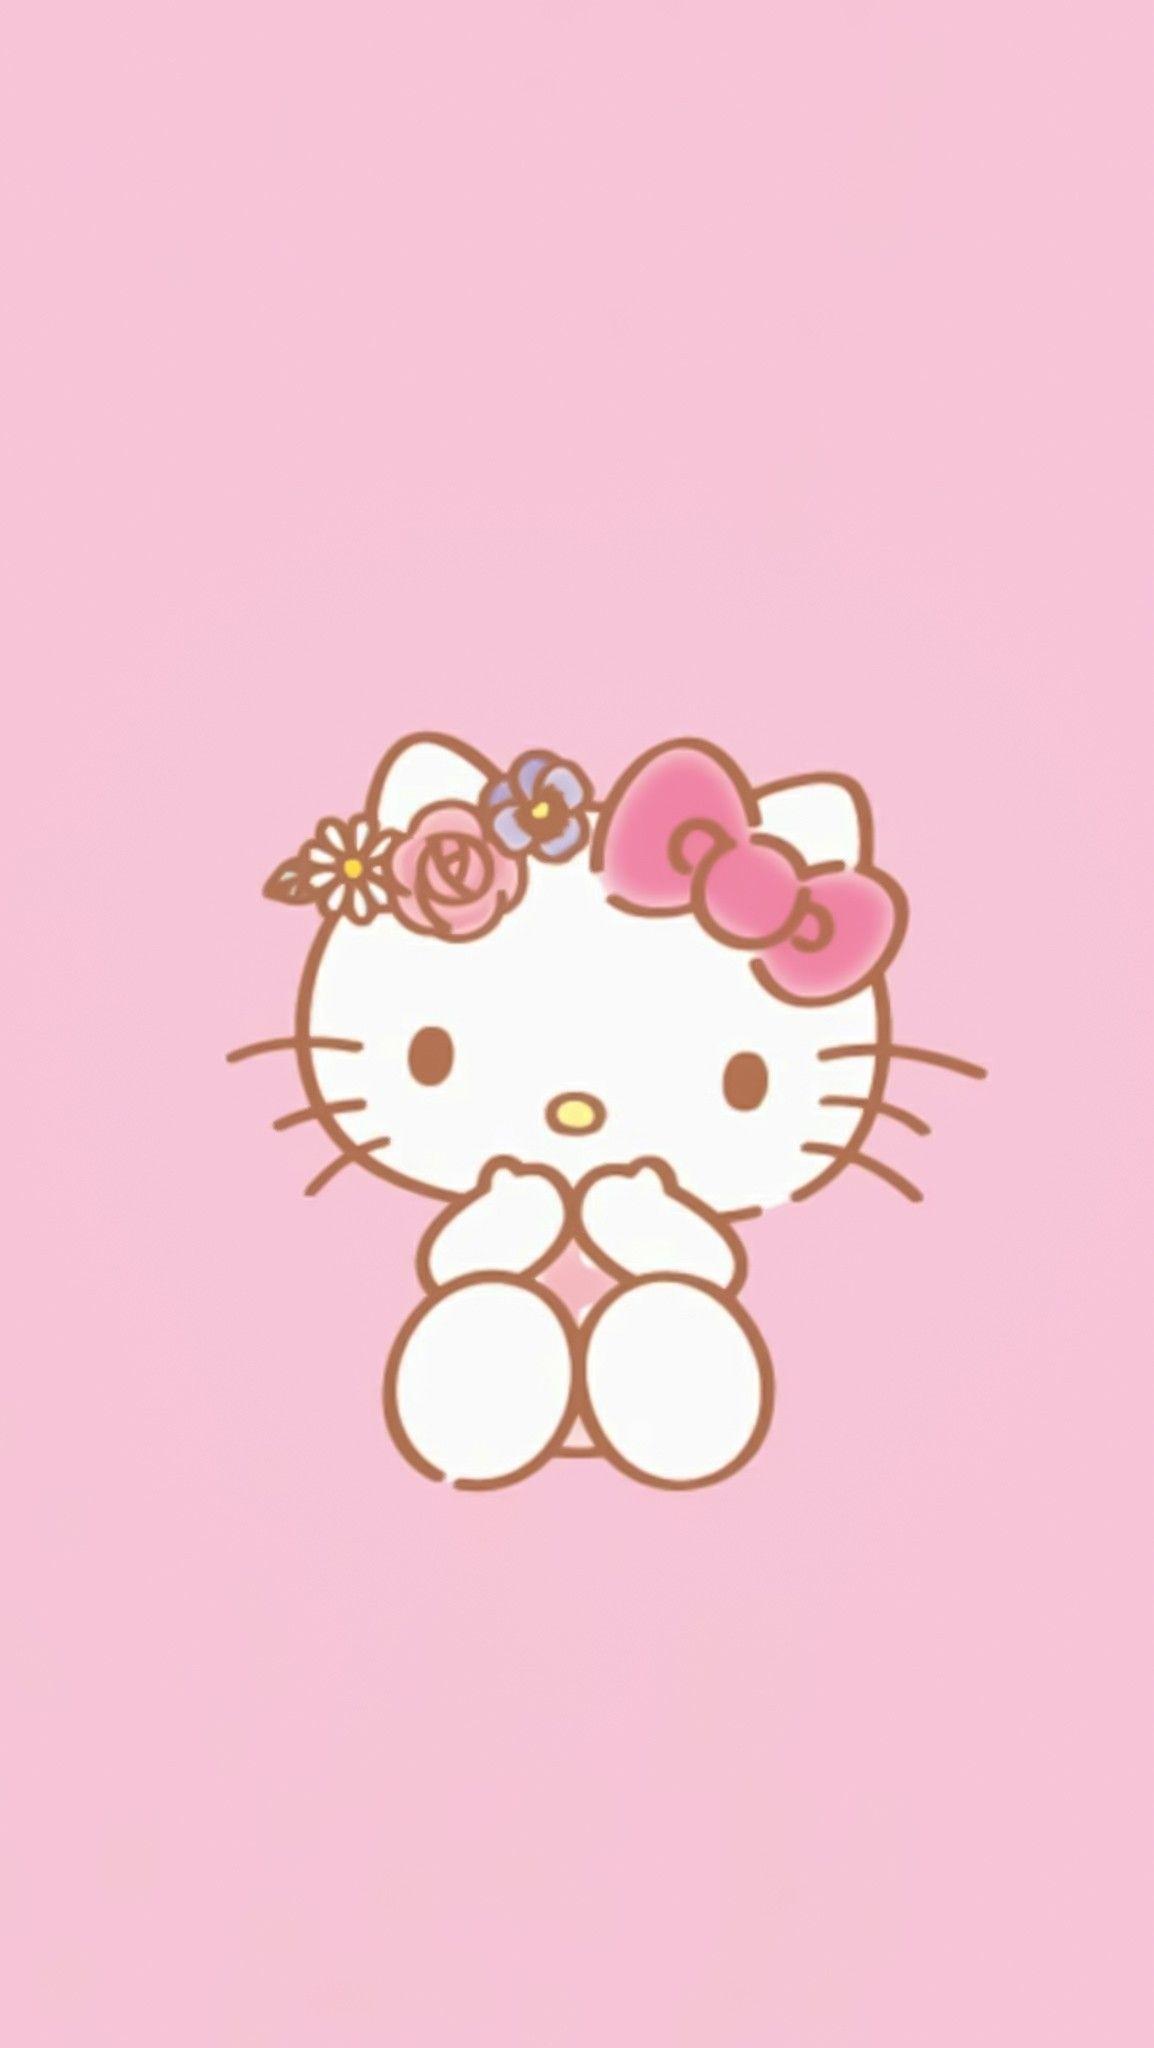 Pin By Aekkalisa On Hello Kitty Bg Hello Kitty Wallpaper Kitty Wallpaper Sanrio Hello Kitty